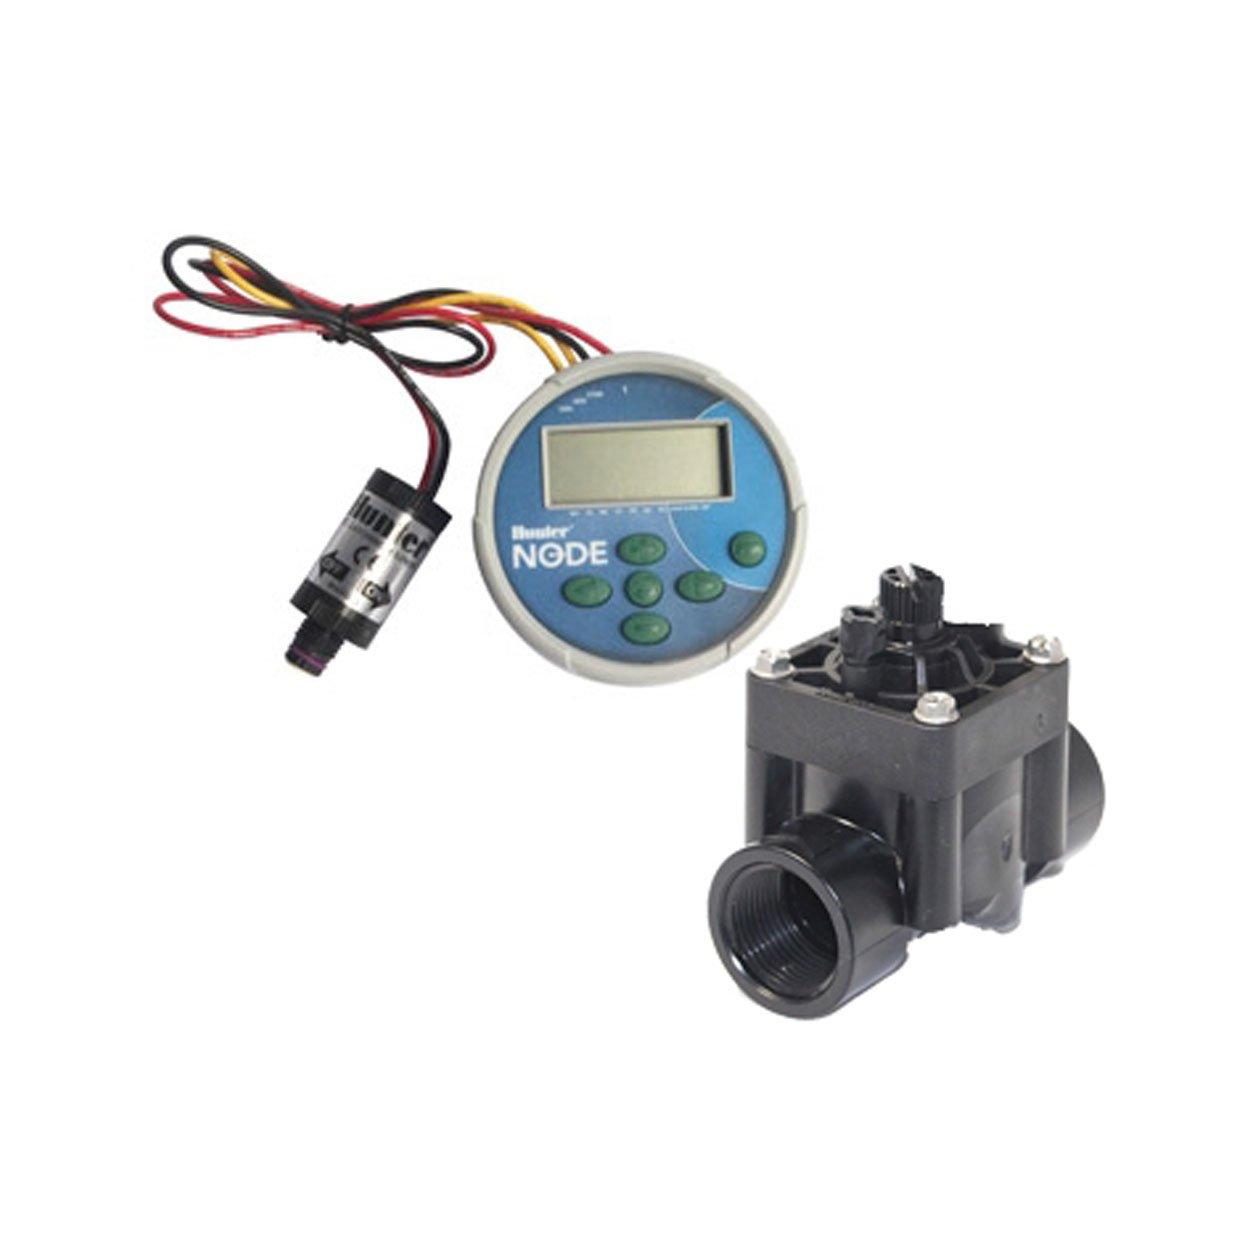 Hunter Sprinkler NODE100VALVE NODE Single Station Controller with DC Latching Solenoid and PGV-101G valve by Hunter (Image #1)